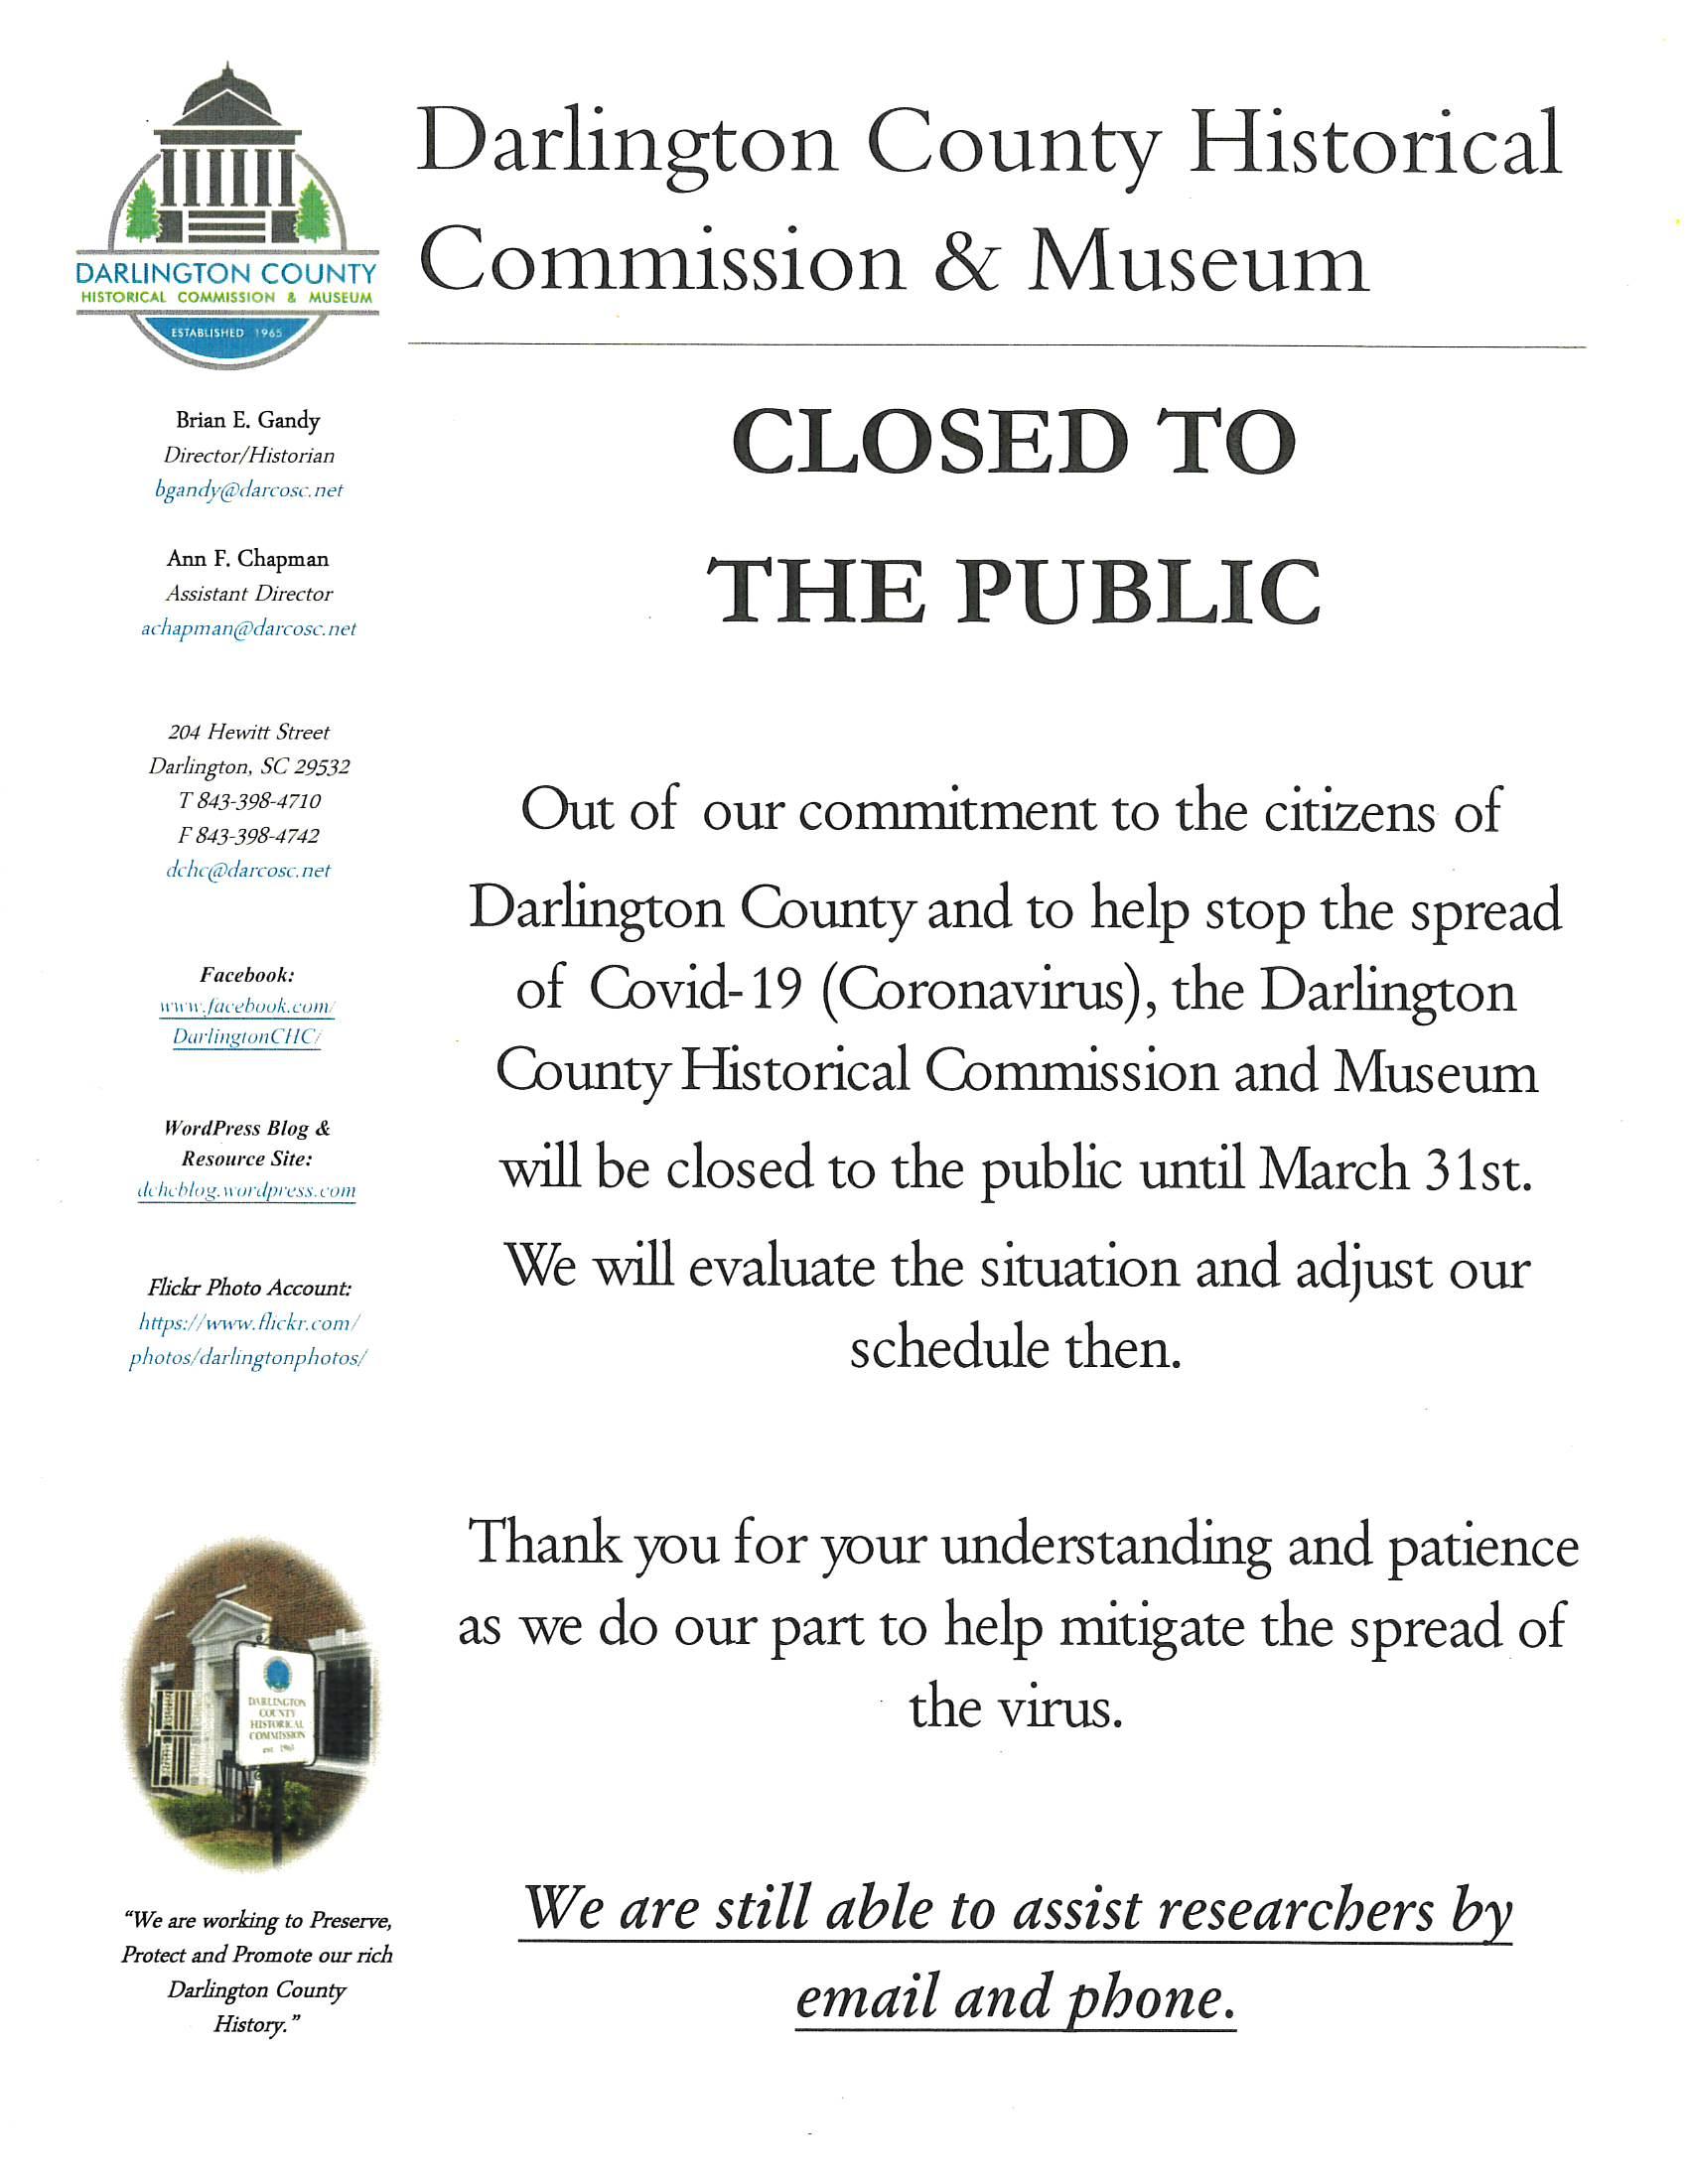 Corona Virus Closure Notice